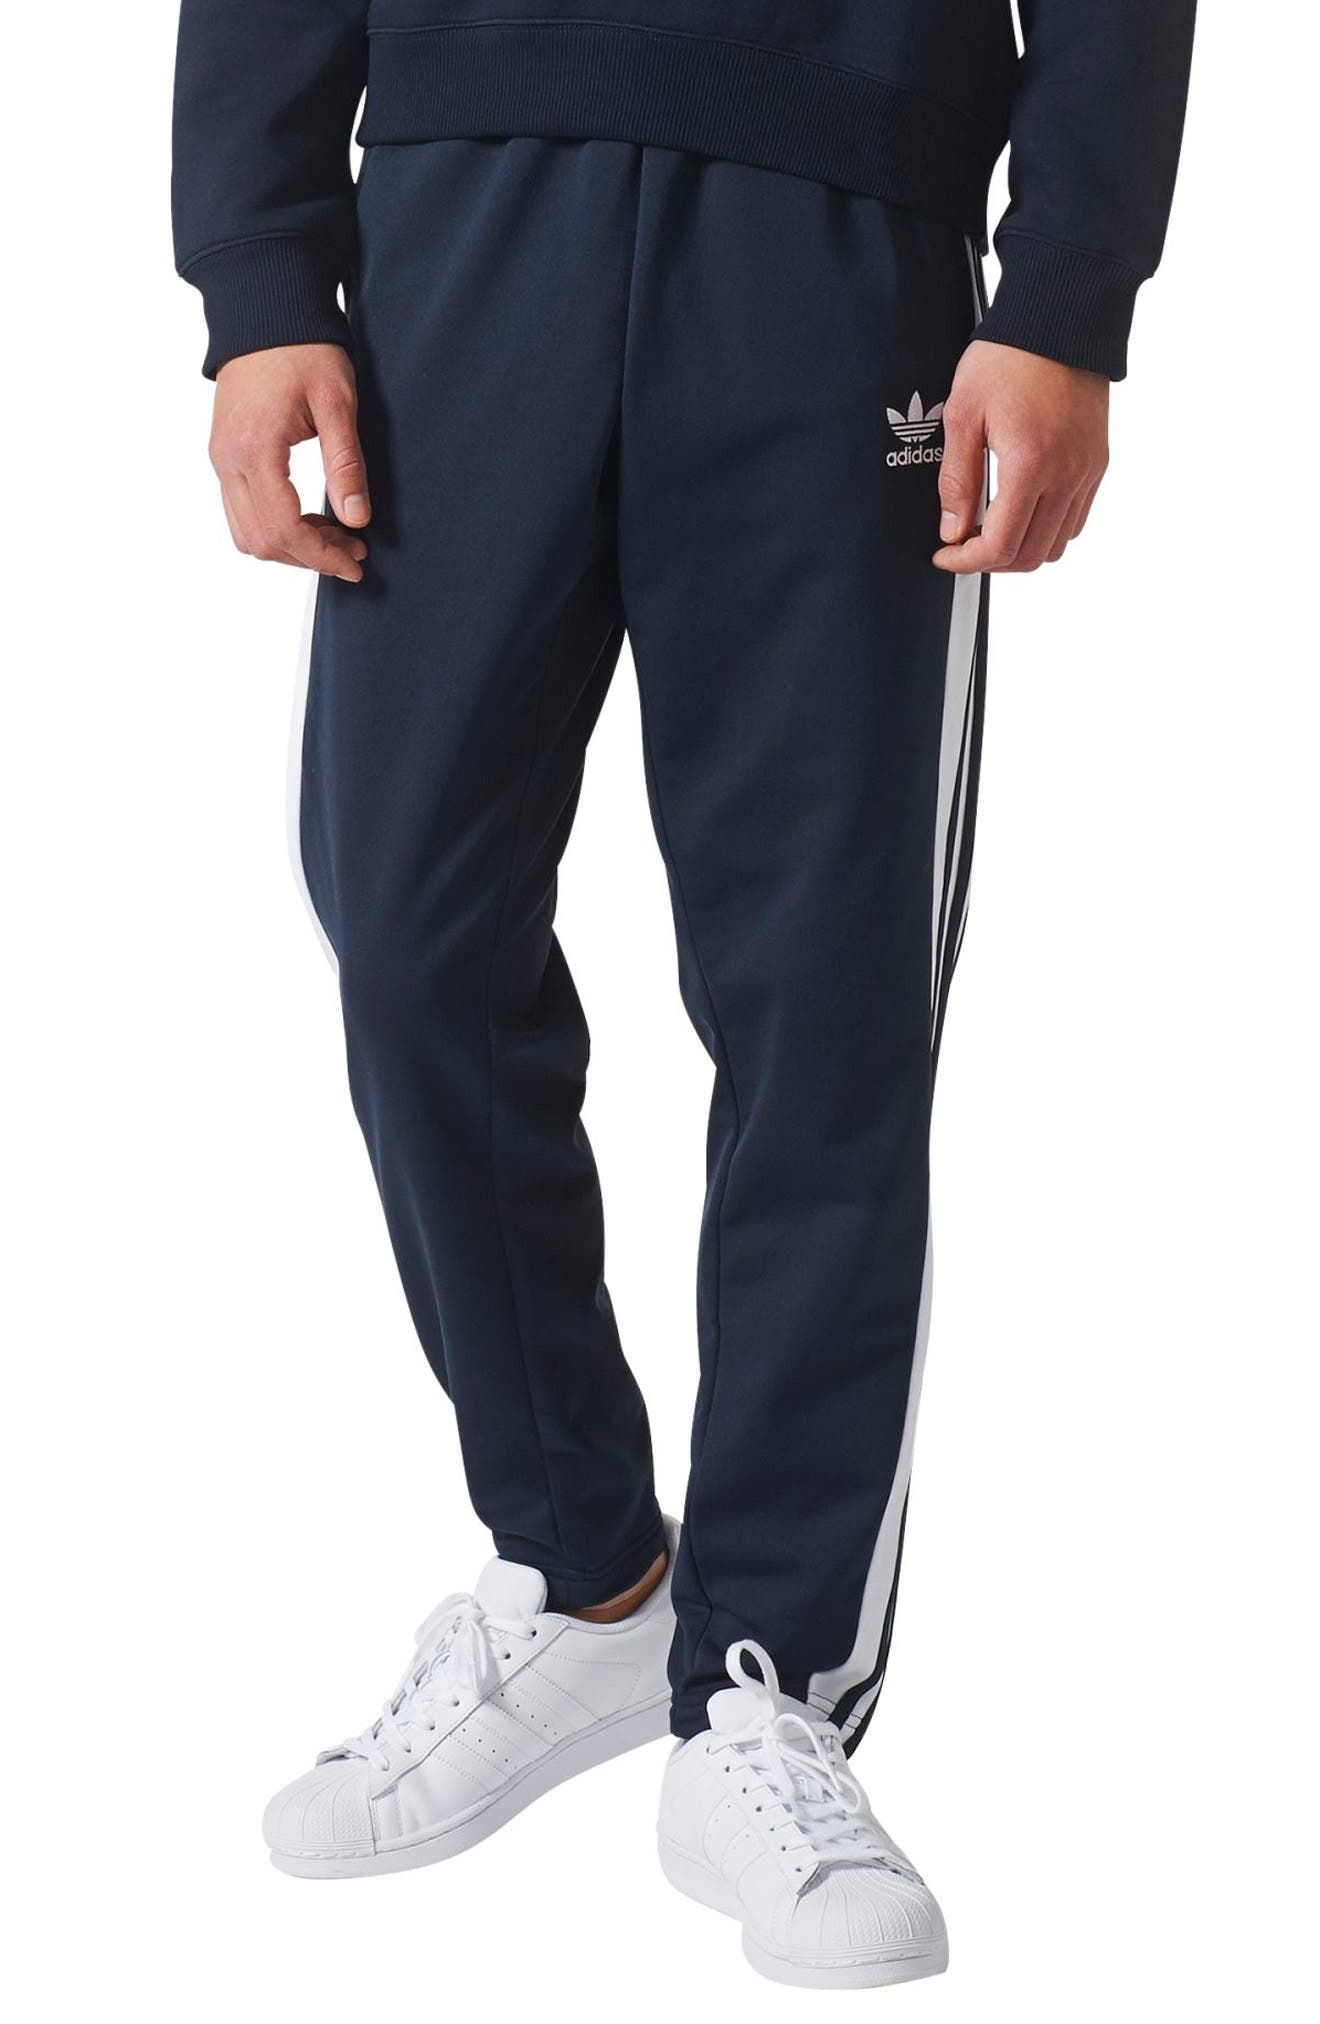 adidas Originals Adibreak Tearaway Track Pants